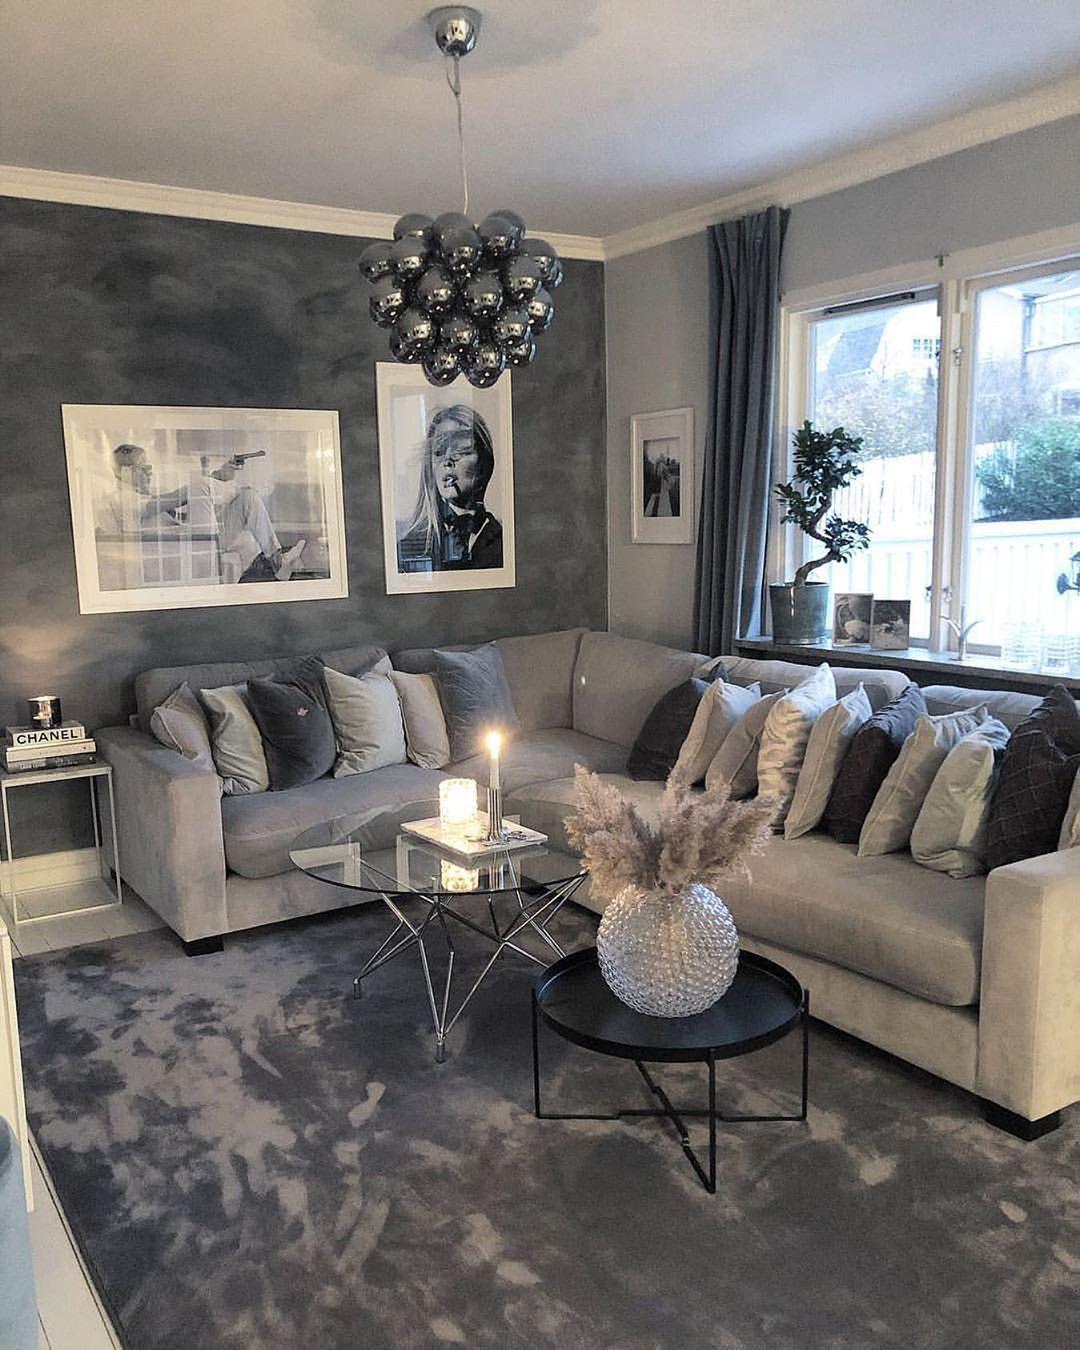 Photo of wonderful home inspired design!